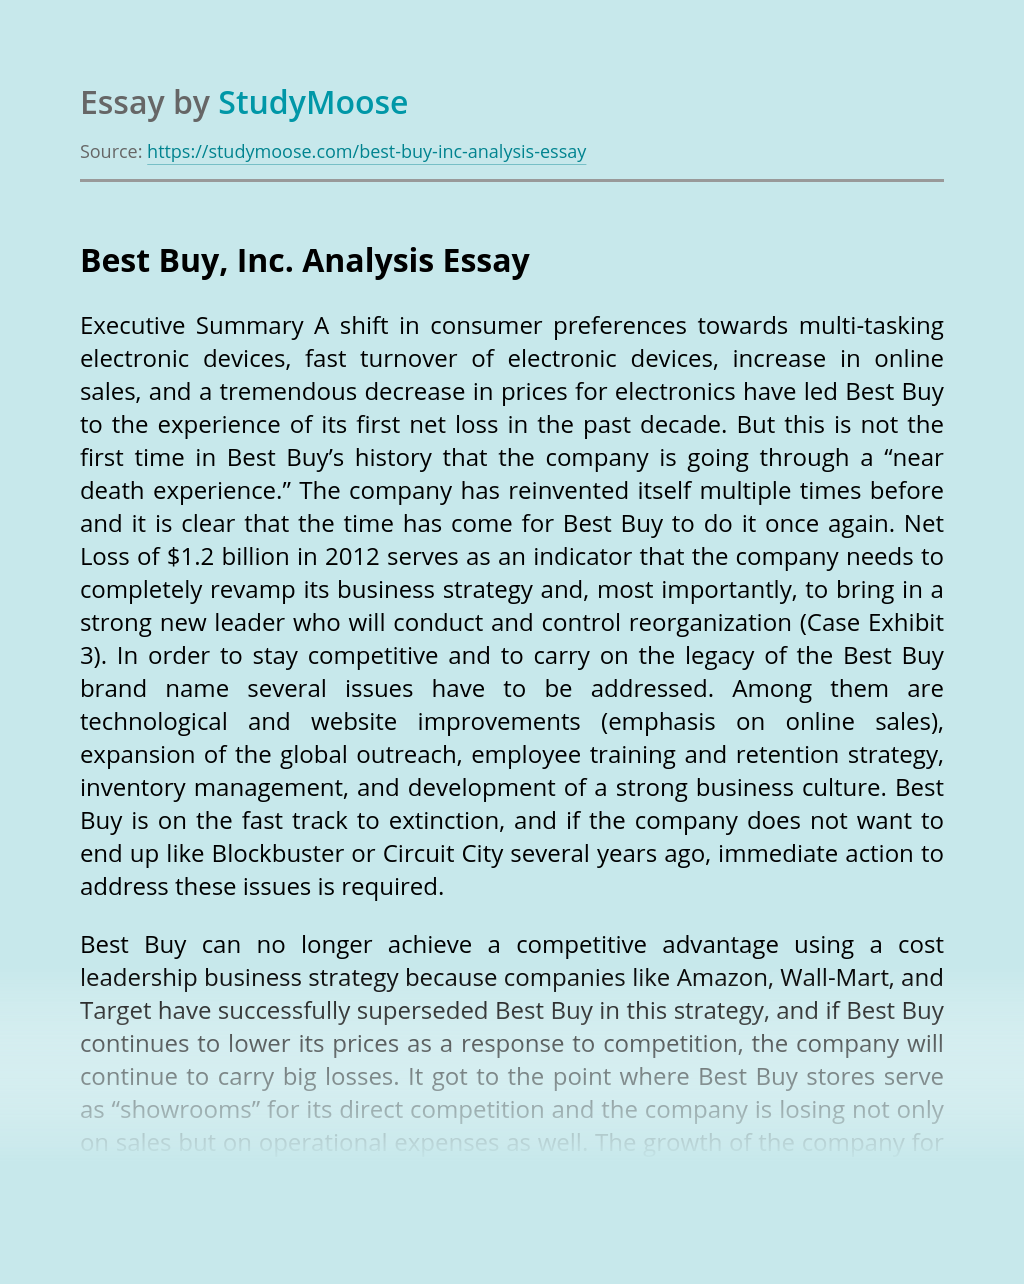 Best Buy, Inc. Analysis